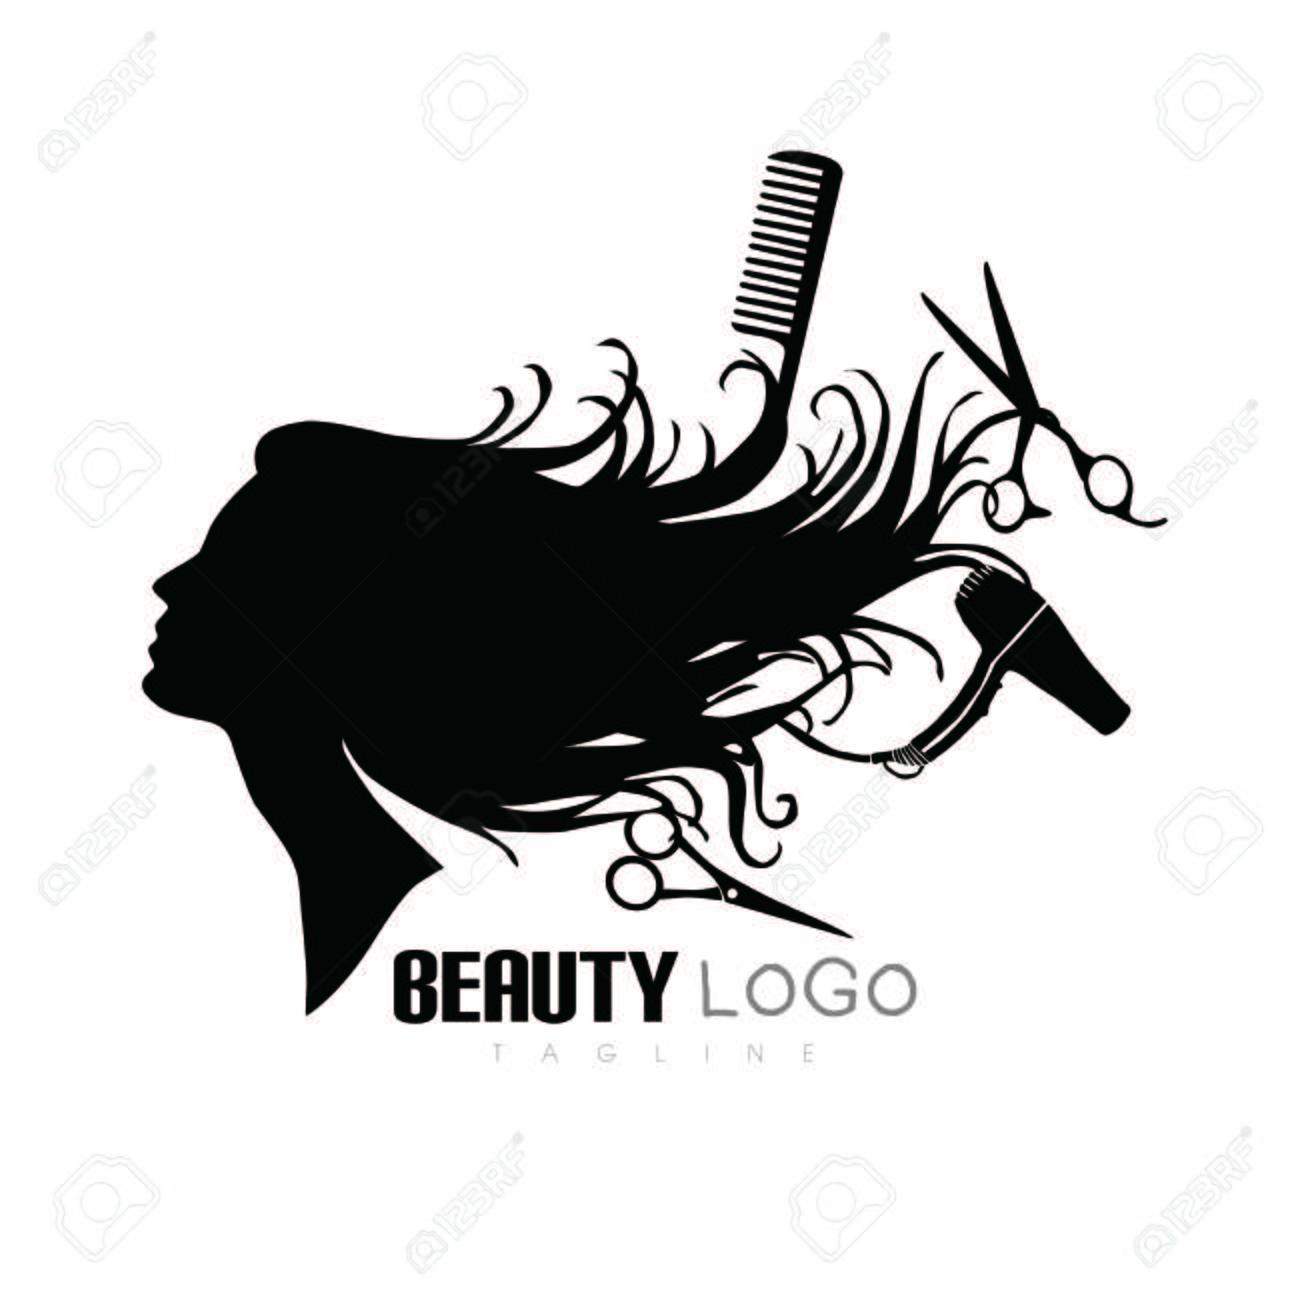 Beauty hair salon logosalon logo royalty free cliparts vectors beauty hair salon logosalon logo stock vector 73470319 altavistaventures Images